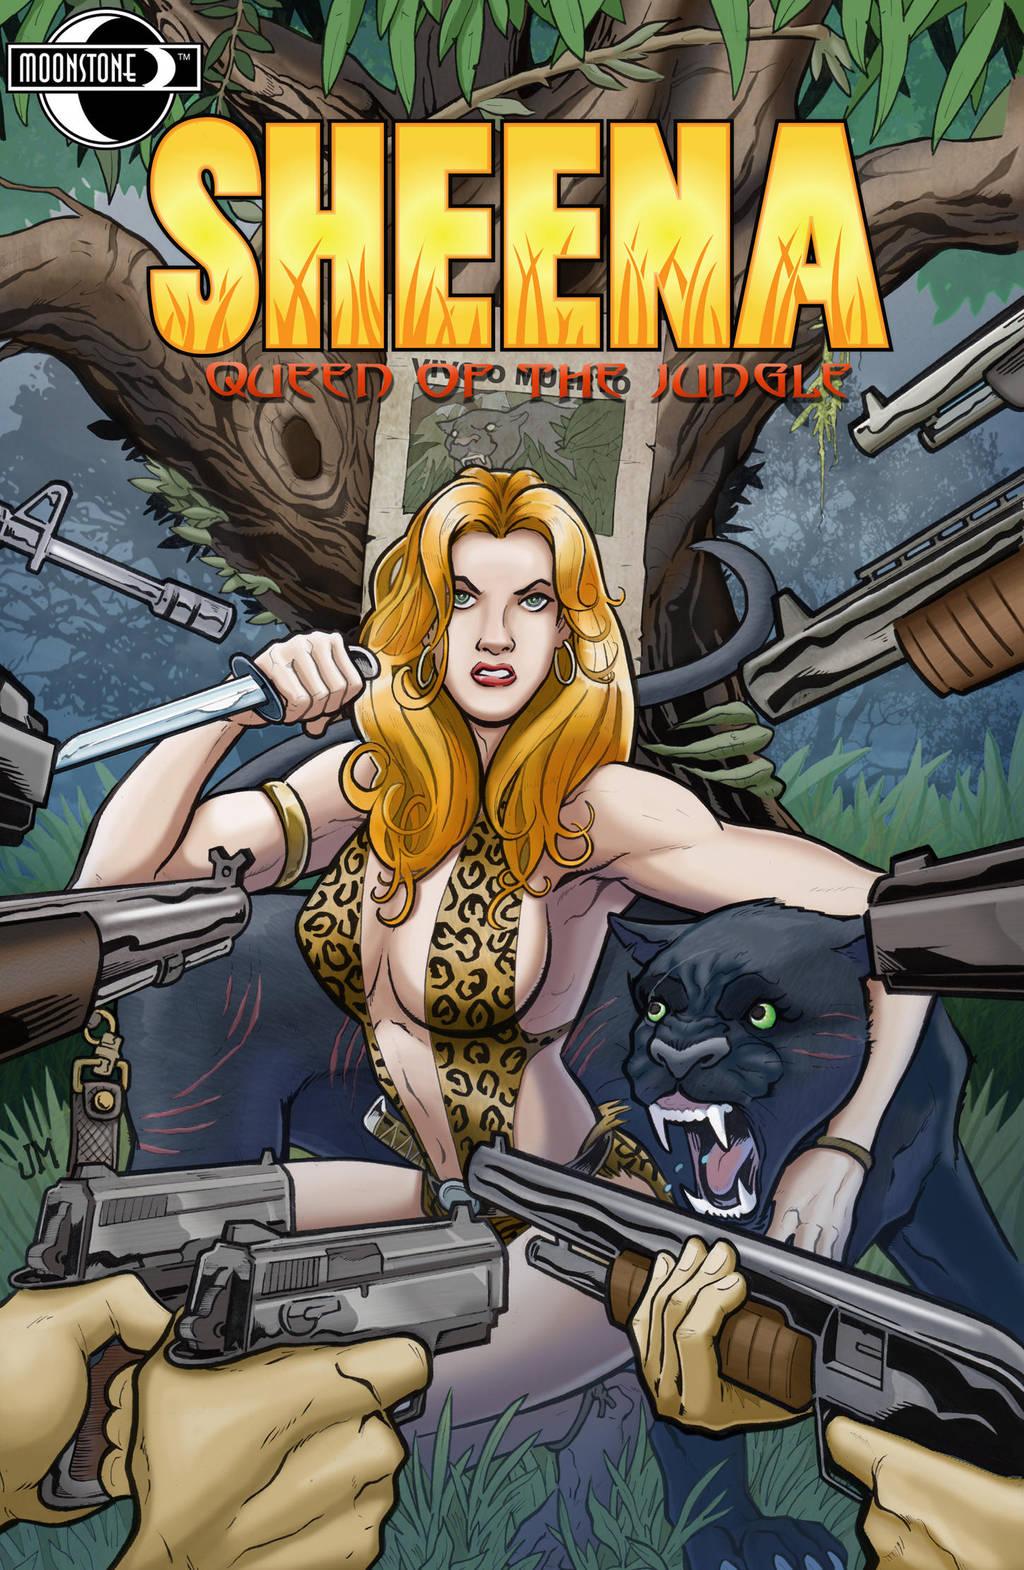 Sheena: Queen of the Jungle #2 by Kminor